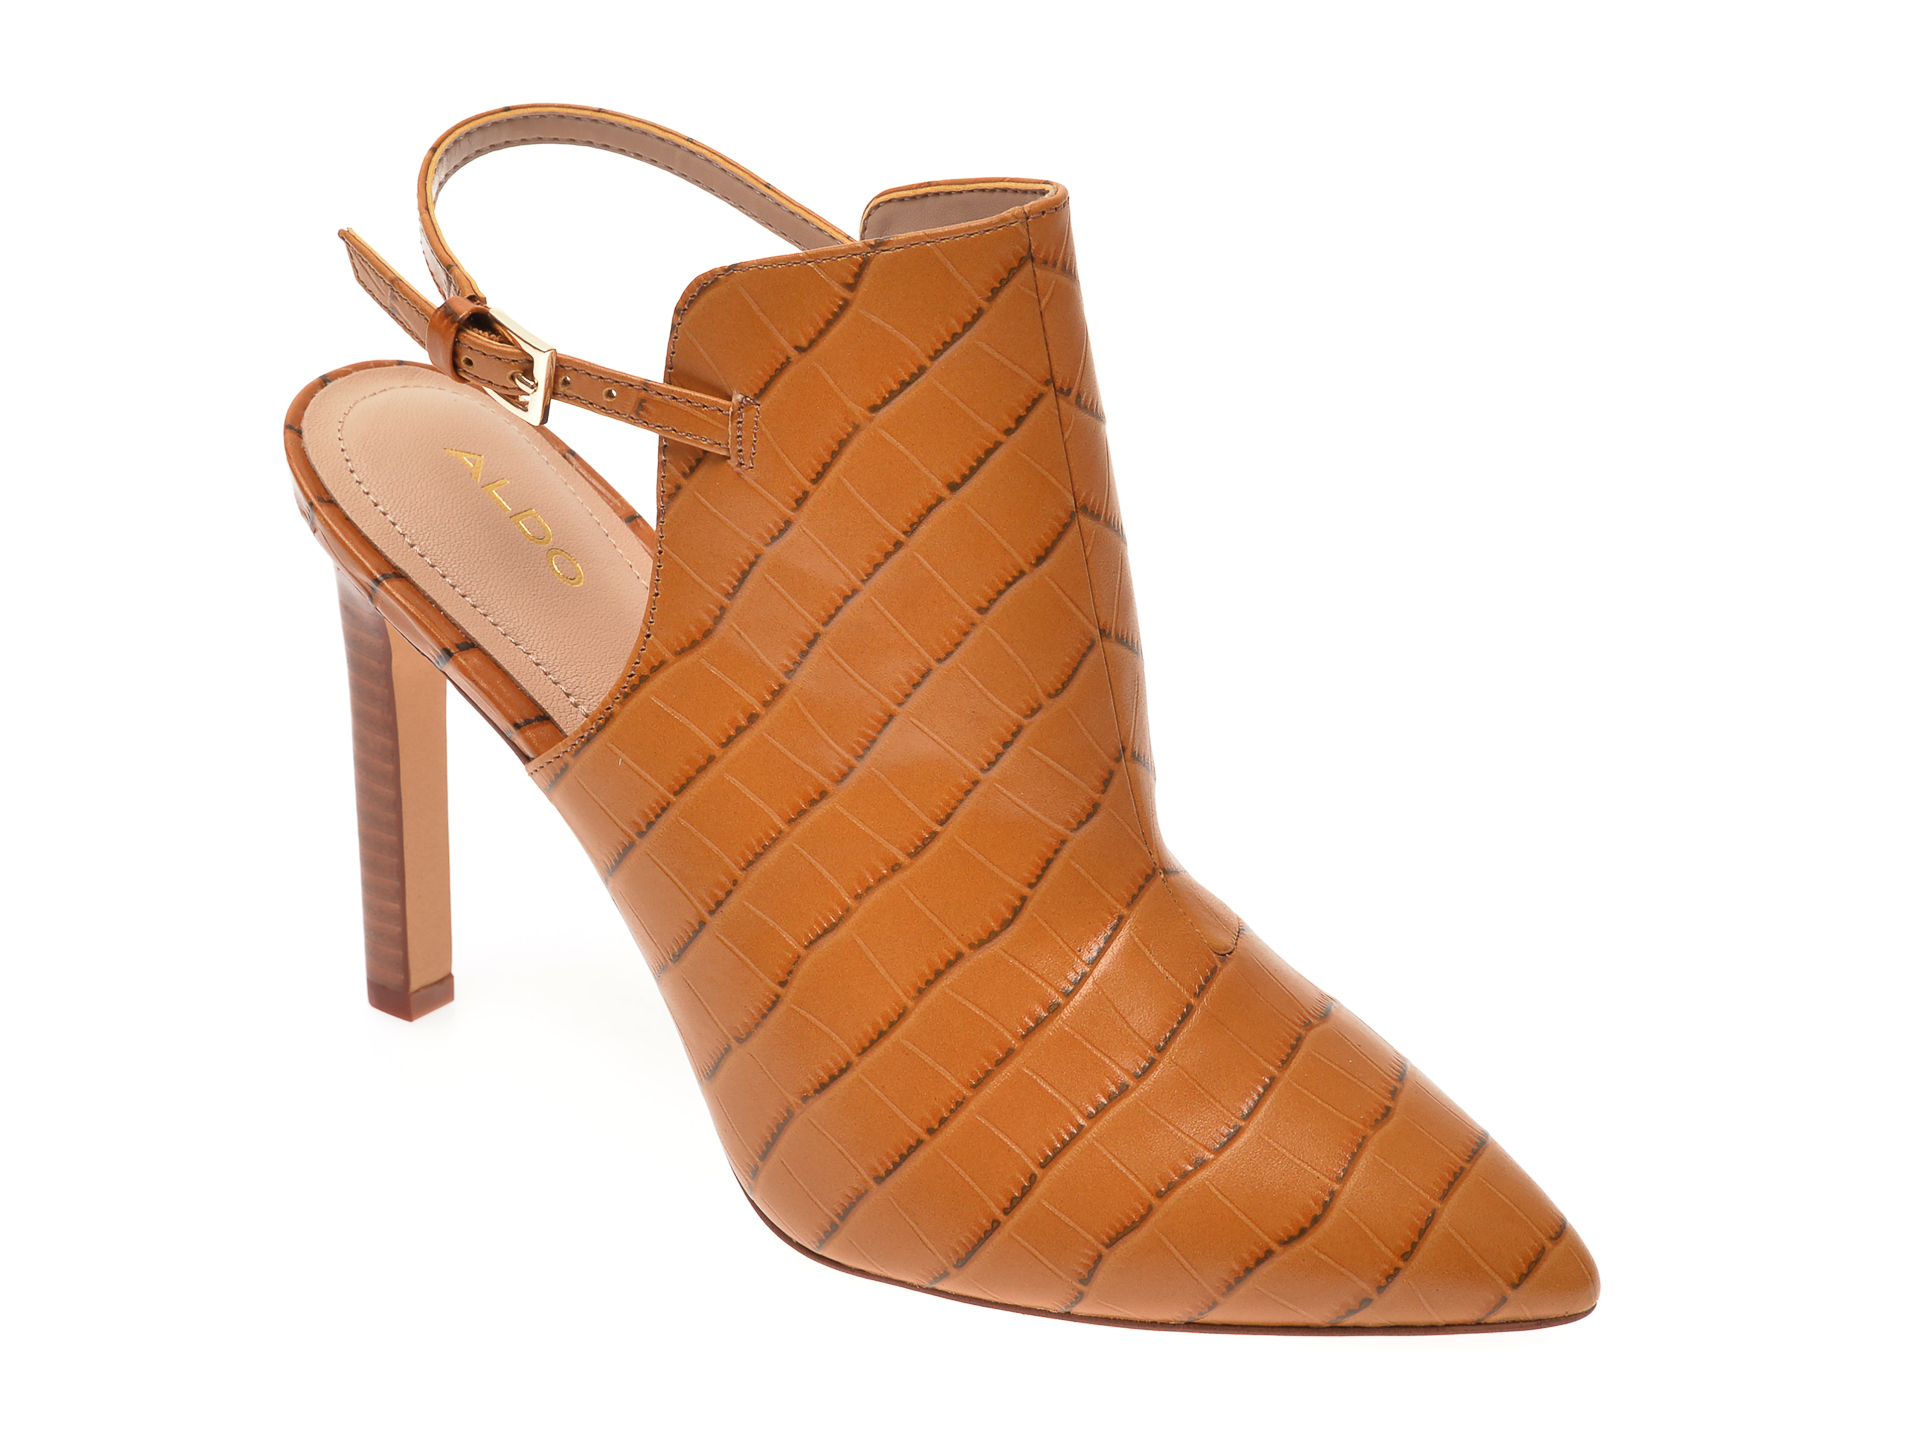 Pantofi ALDO maro, Firleigh220, din piele naturala imagine otter.ro